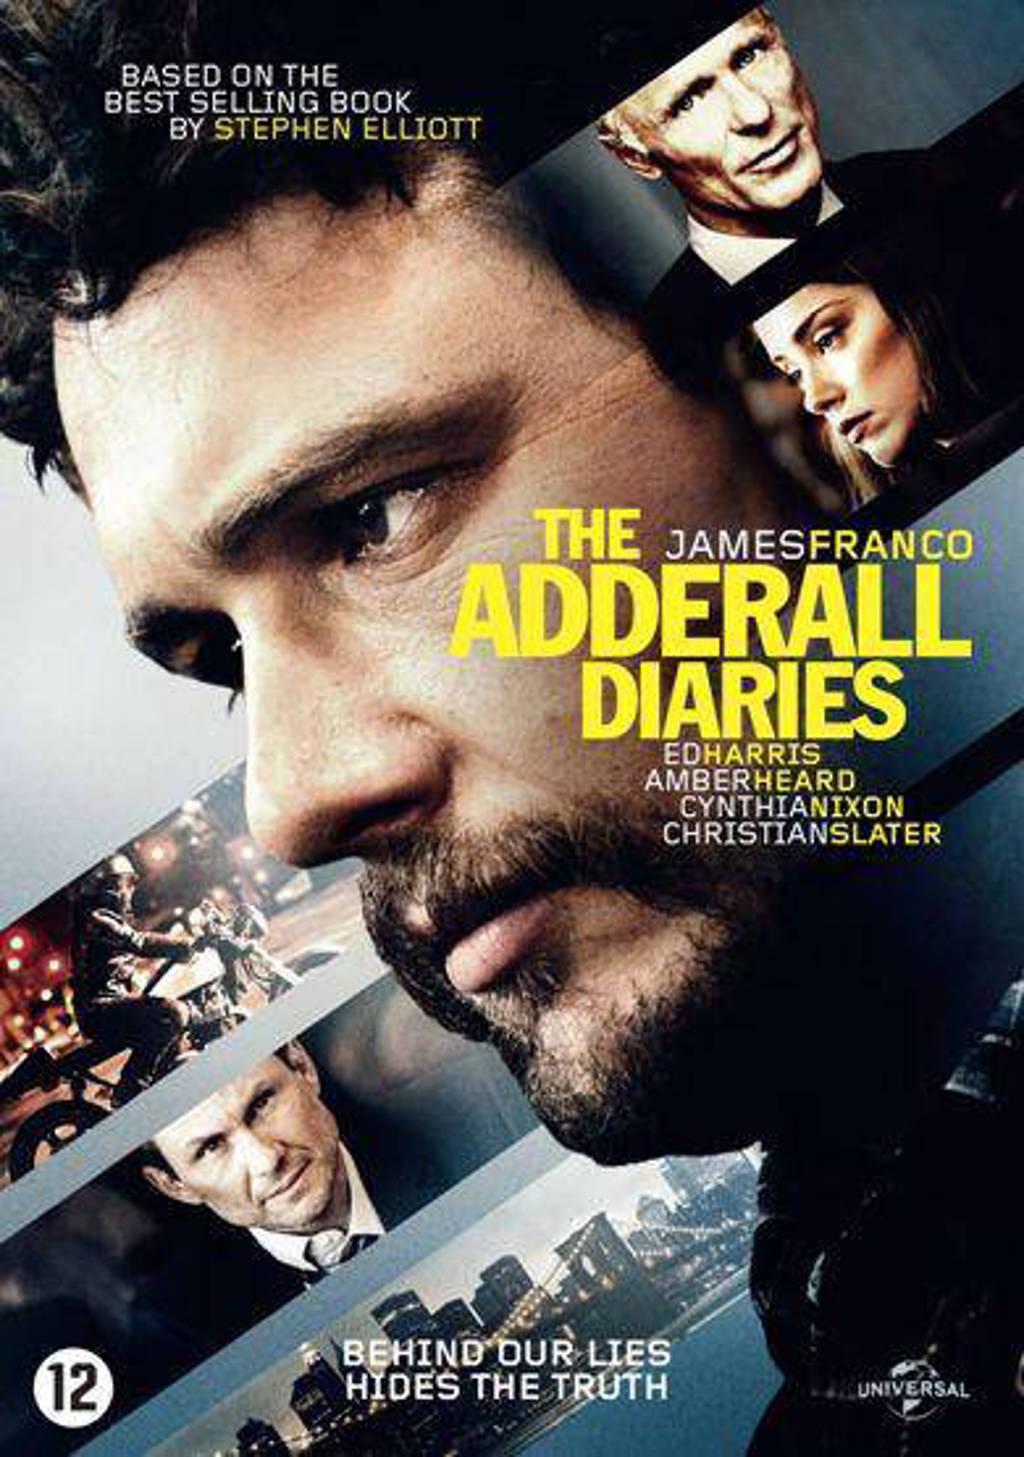 Adderall diaries (DVD)